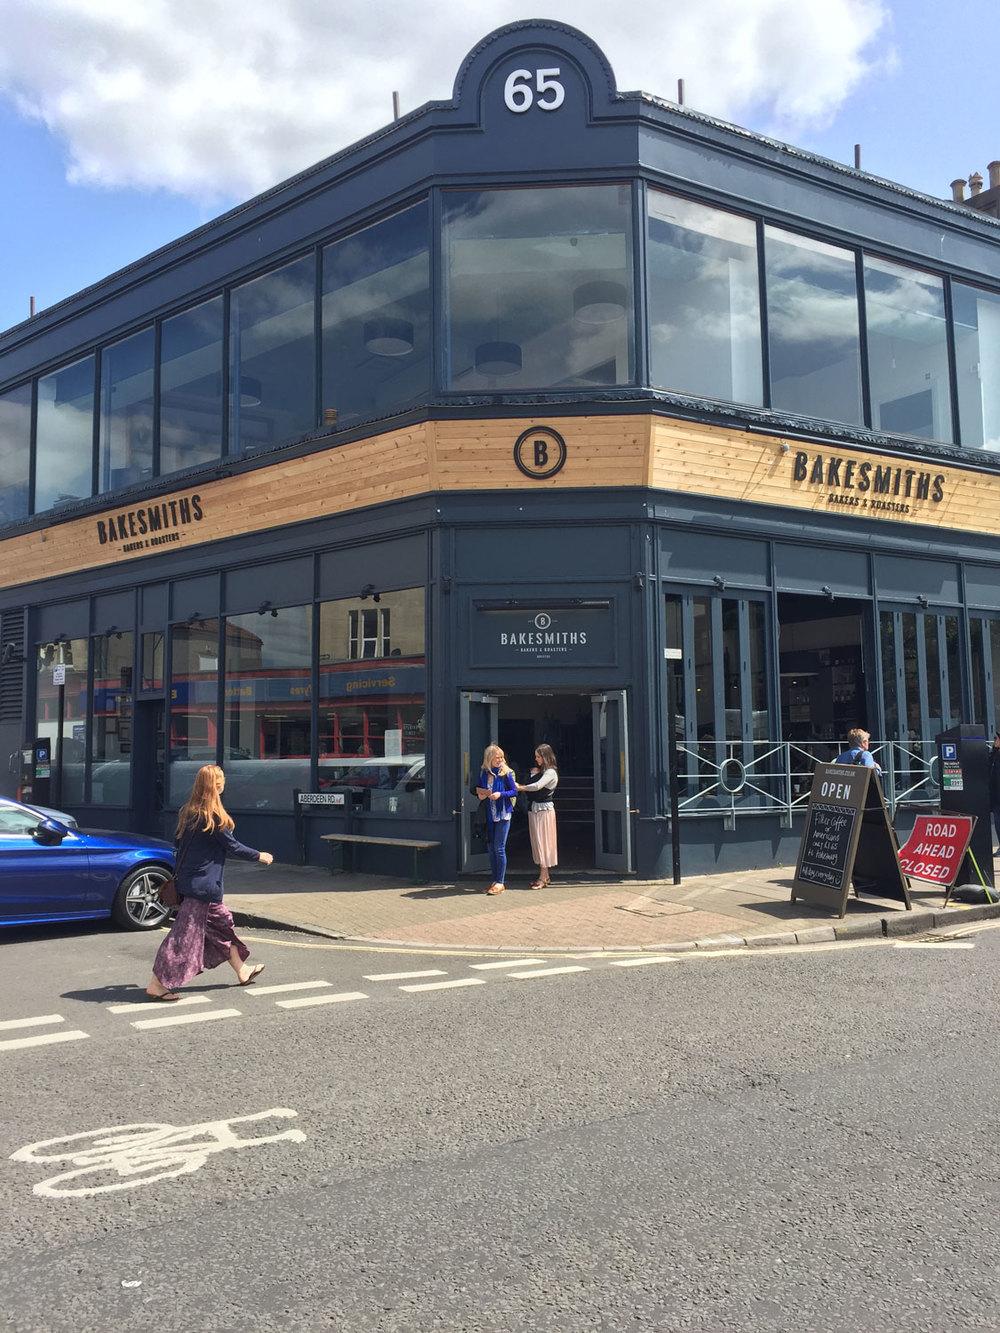 Bakesmiths-Coffee-Shop-Branding-Shop-Front-Signange-by-Get-it-Sorted.jpg